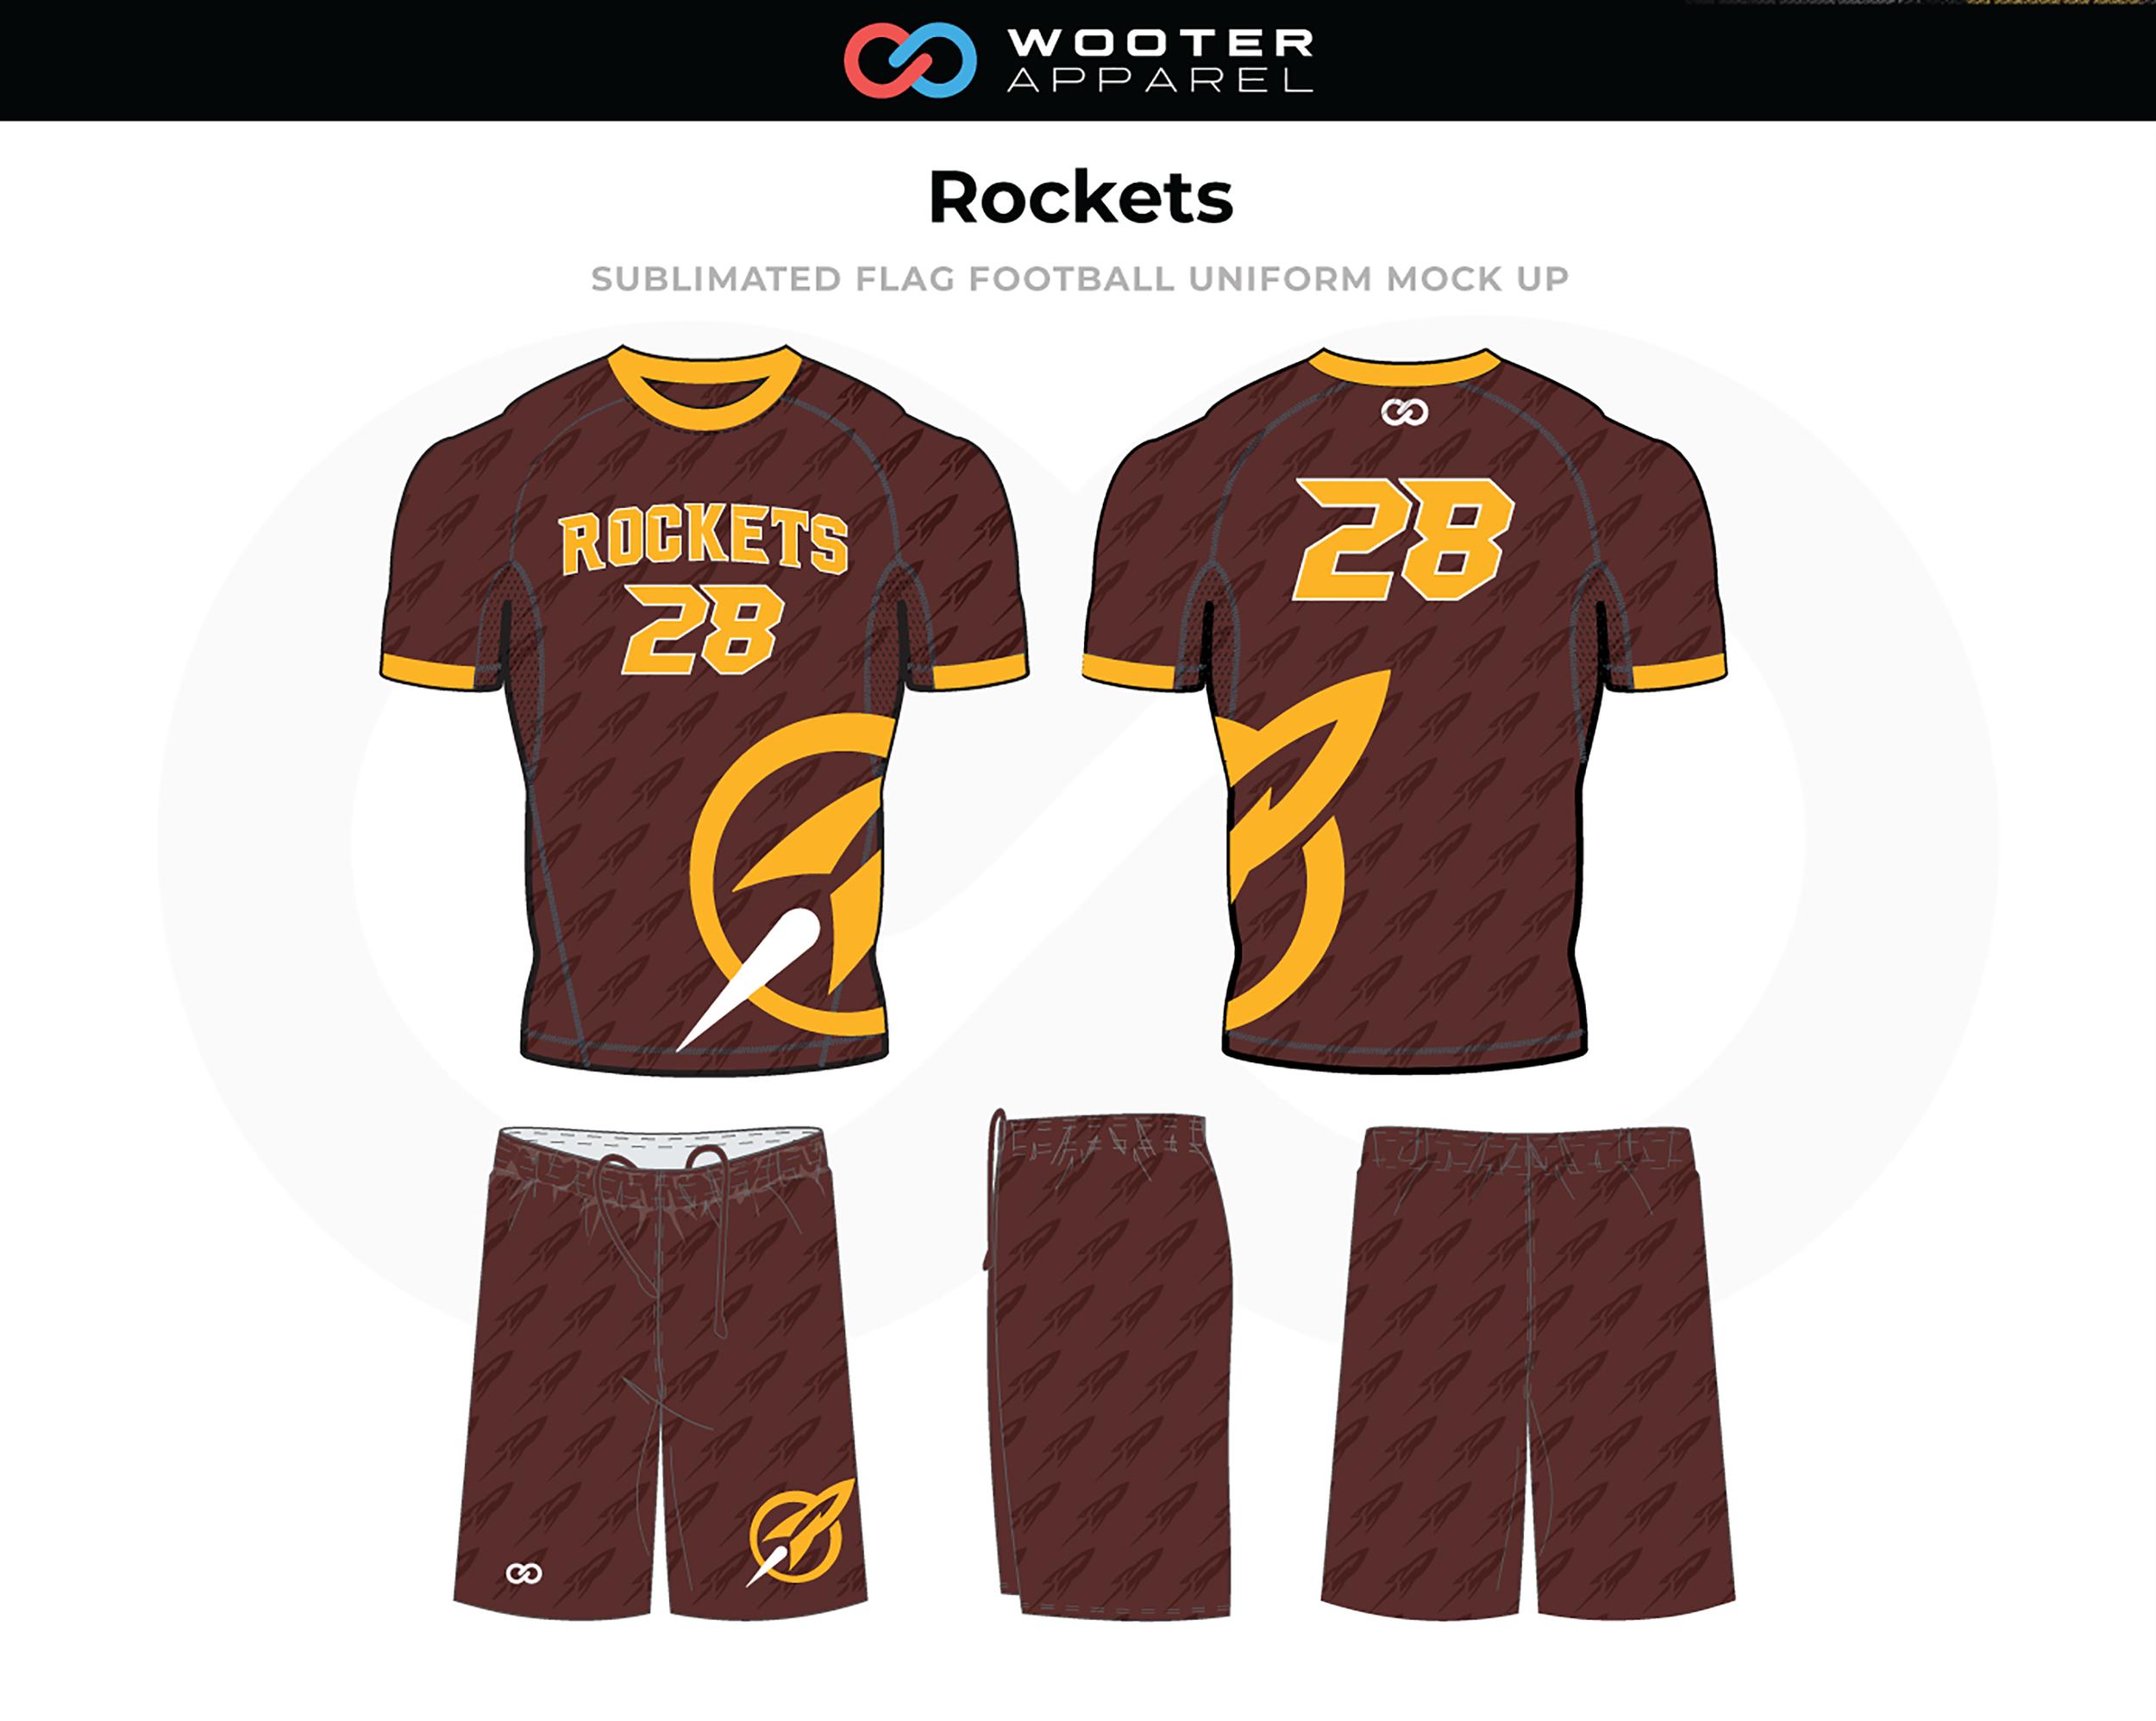 Rockets-Flag-Football-Uniform-Mock-Up_-V2.png